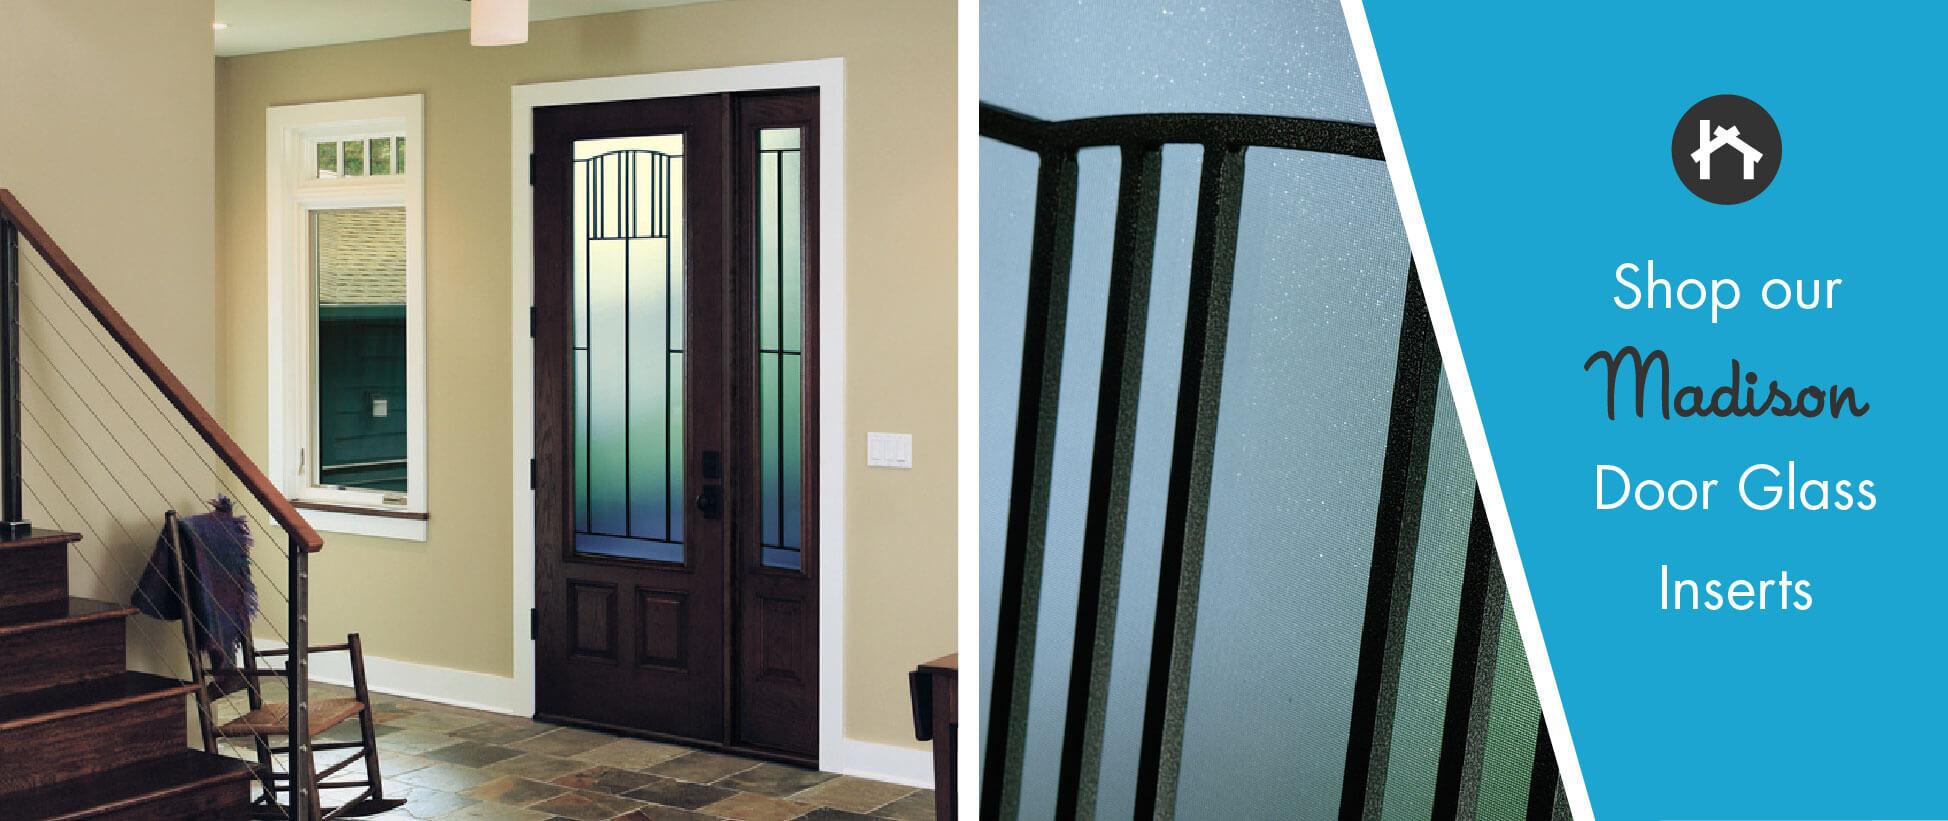 Craftsman Door Glass Inserts With Wrought Iron Odl Madison Zabitat